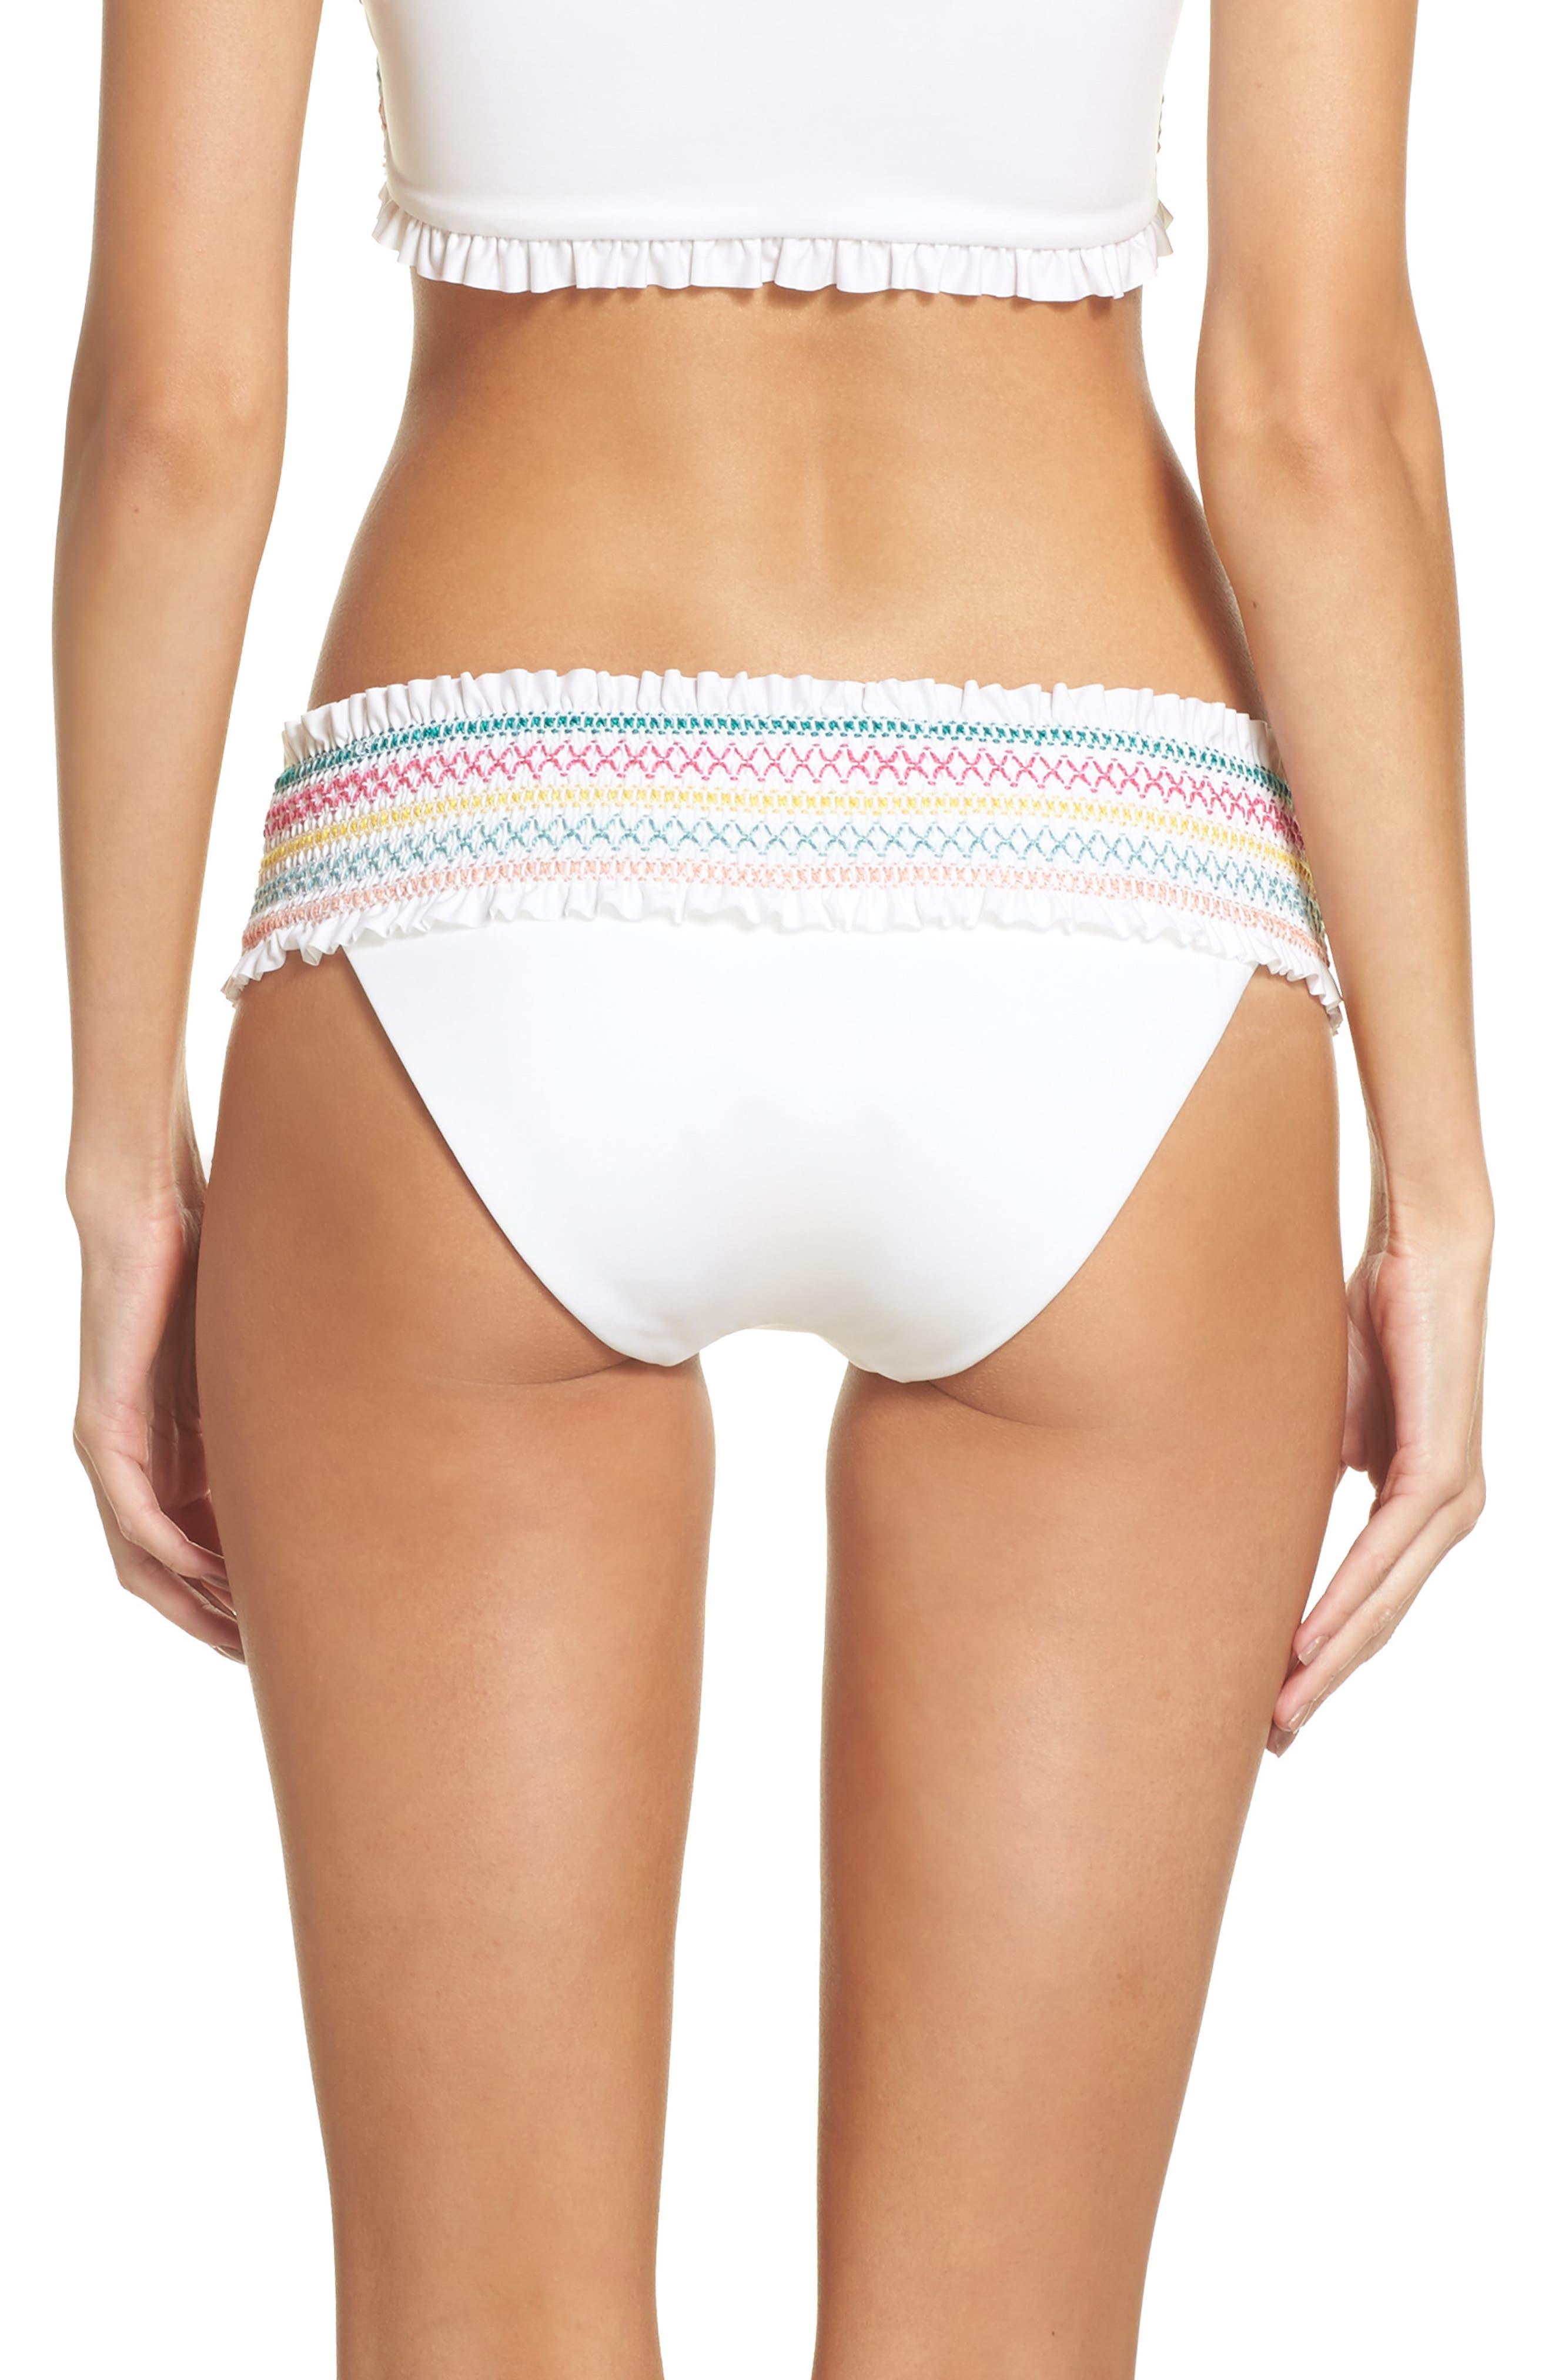 Crystal Cove Smocked Bikini Bottoms,                             Alternate thumbnail 2, color,                             White